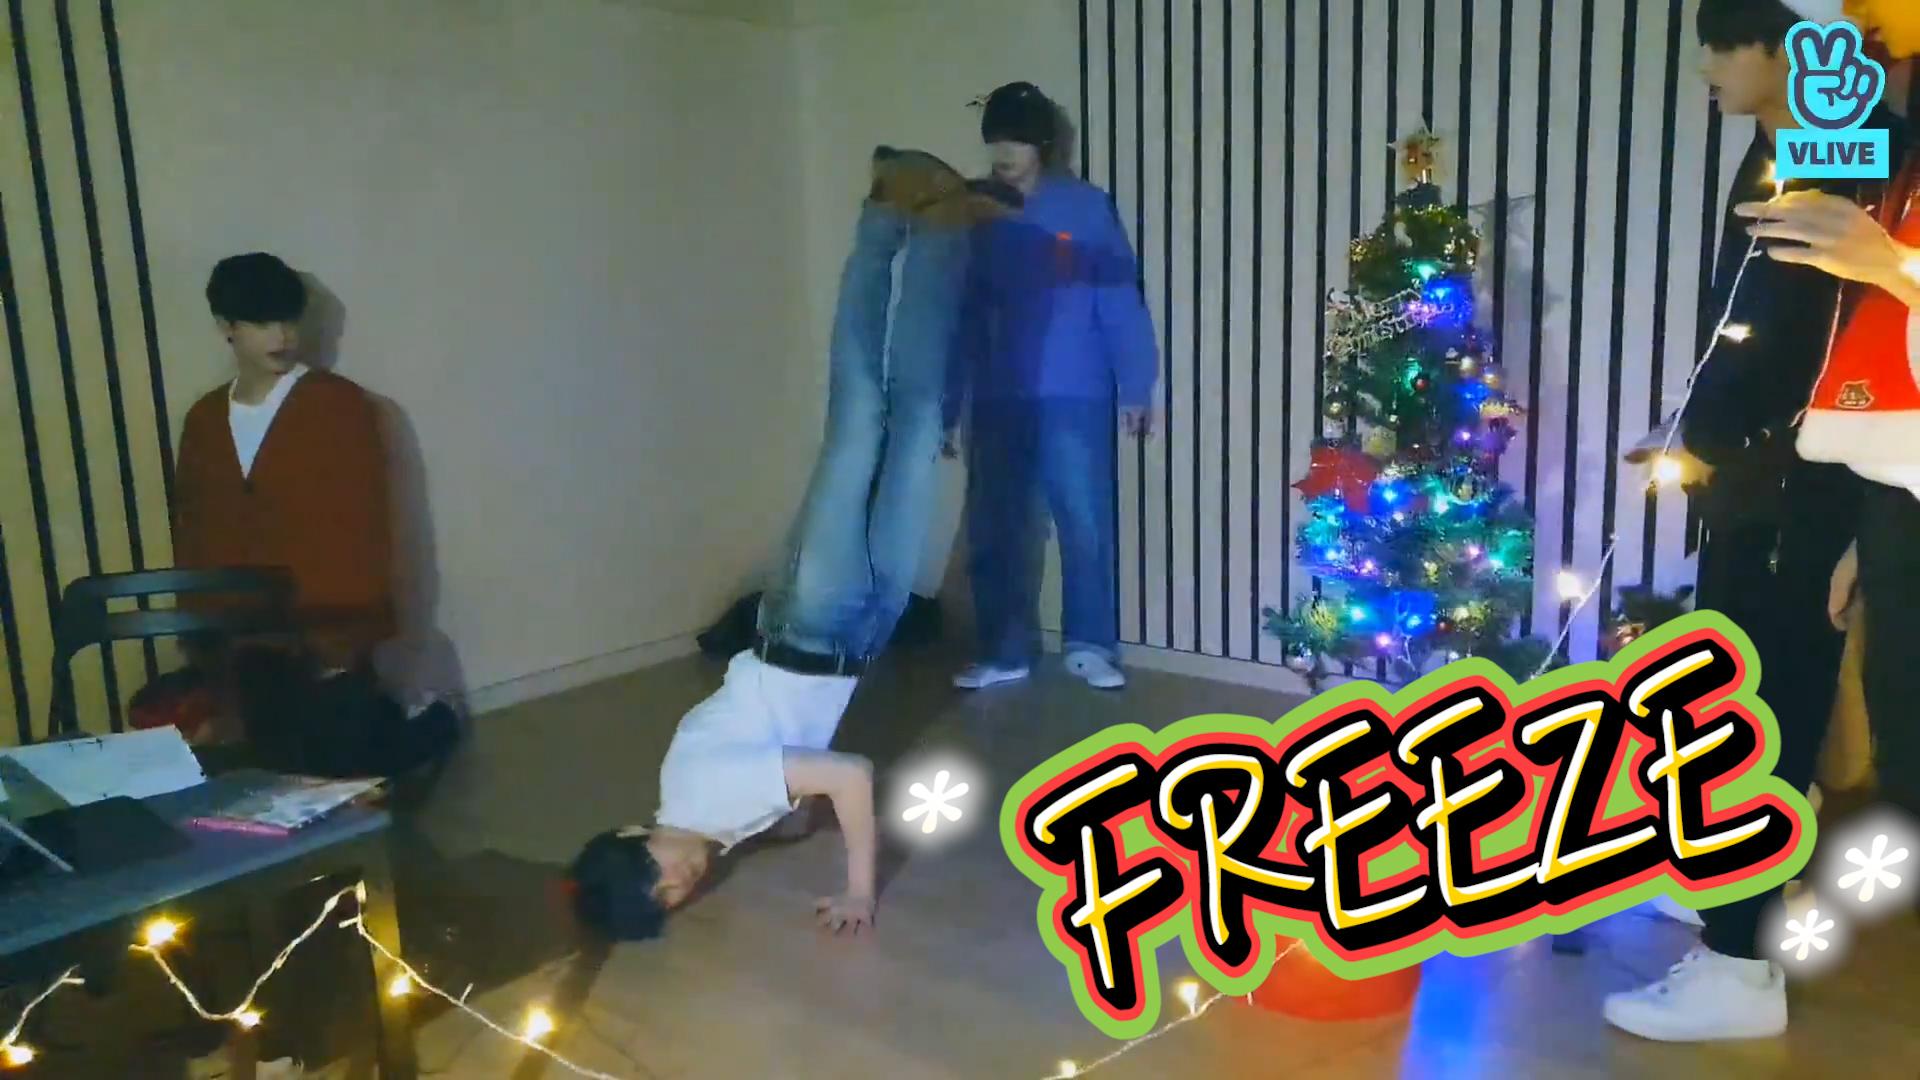 [TXT] 이 순간을 ❄️FREEZE❄️ 하고 싶은 투바투의 꾸미 트리기 시간🎄💕 (TXT drawing Christmas trees&making Christmas trees)